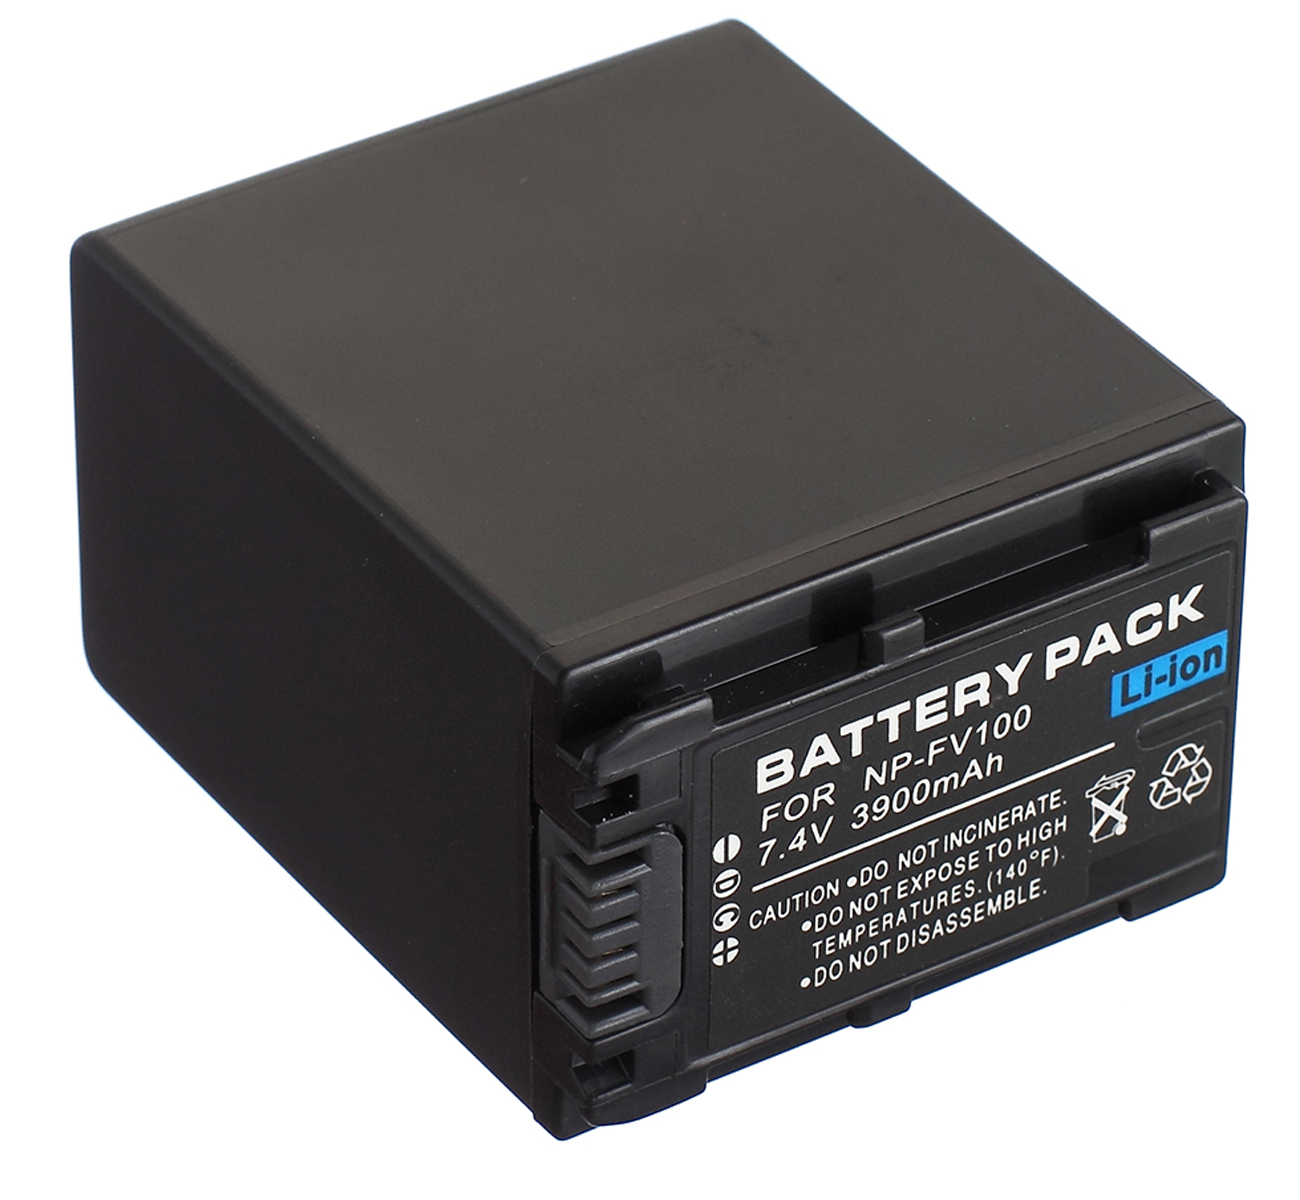 HDR-PJ390 Handycam Camcorder Battery Pack for Sony HDR-PJ350 HDR-PJ380